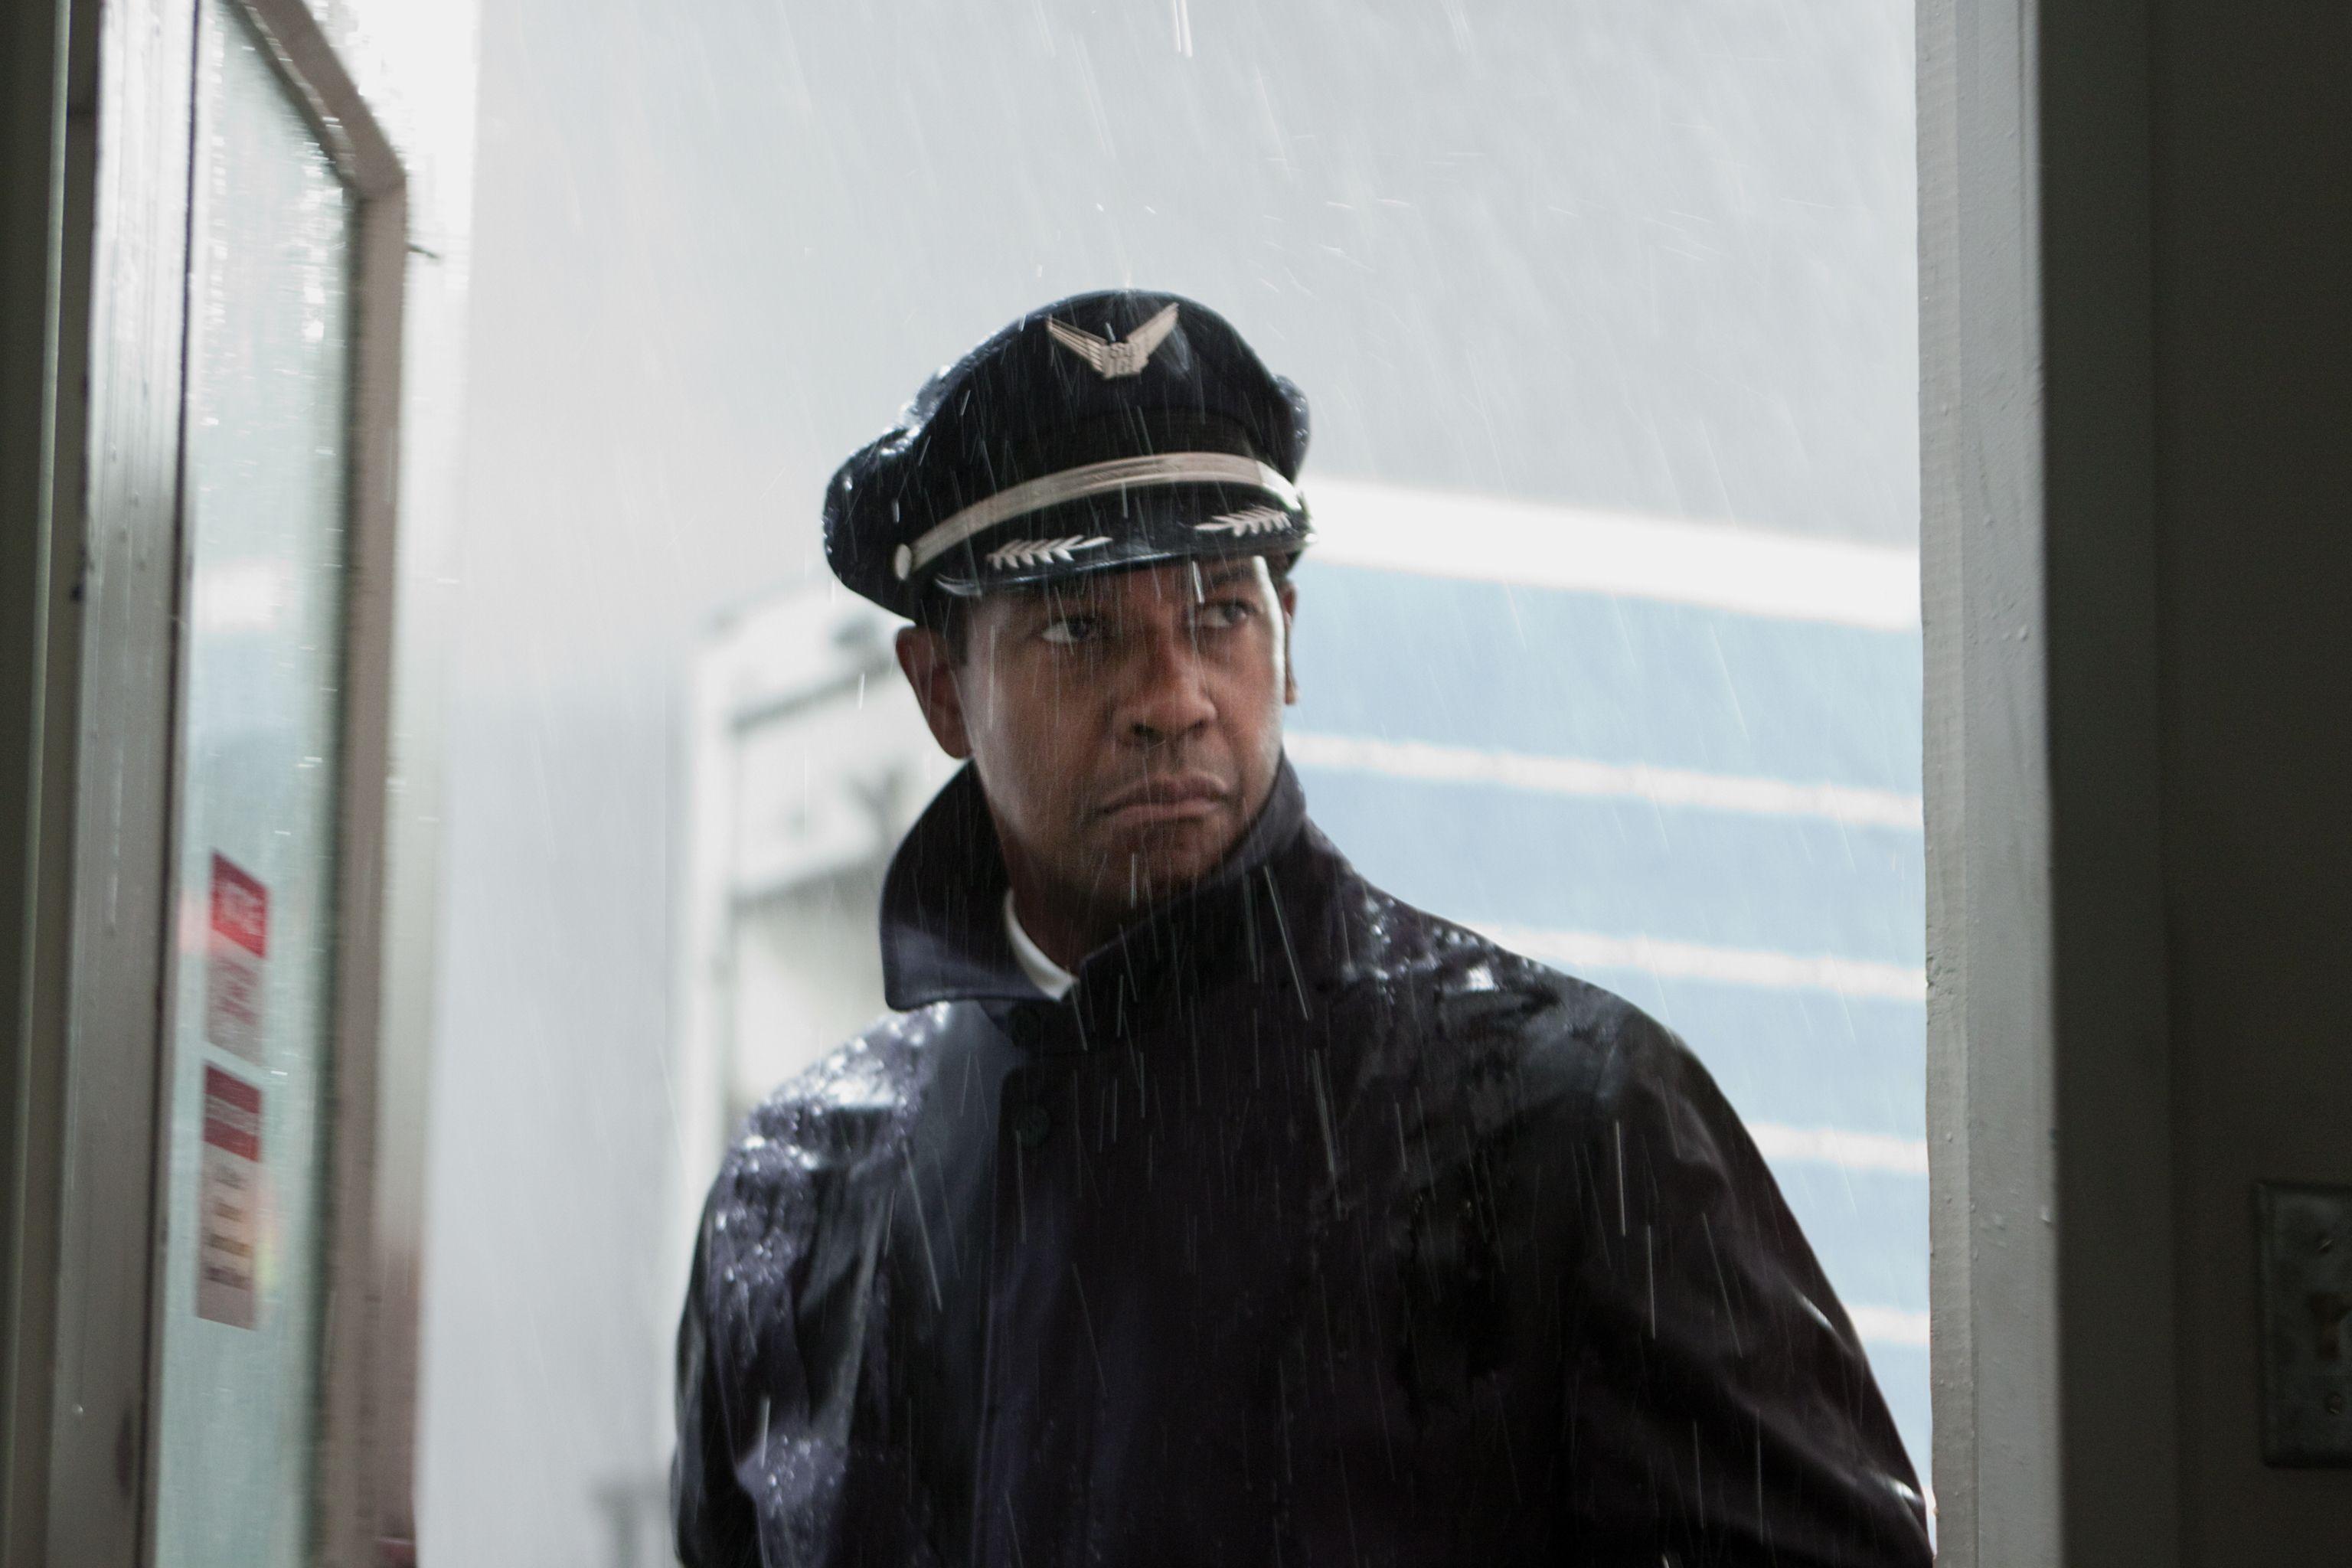 Over 20 New Images from Robert Zemeckis' FLIGHT Starring Denzel